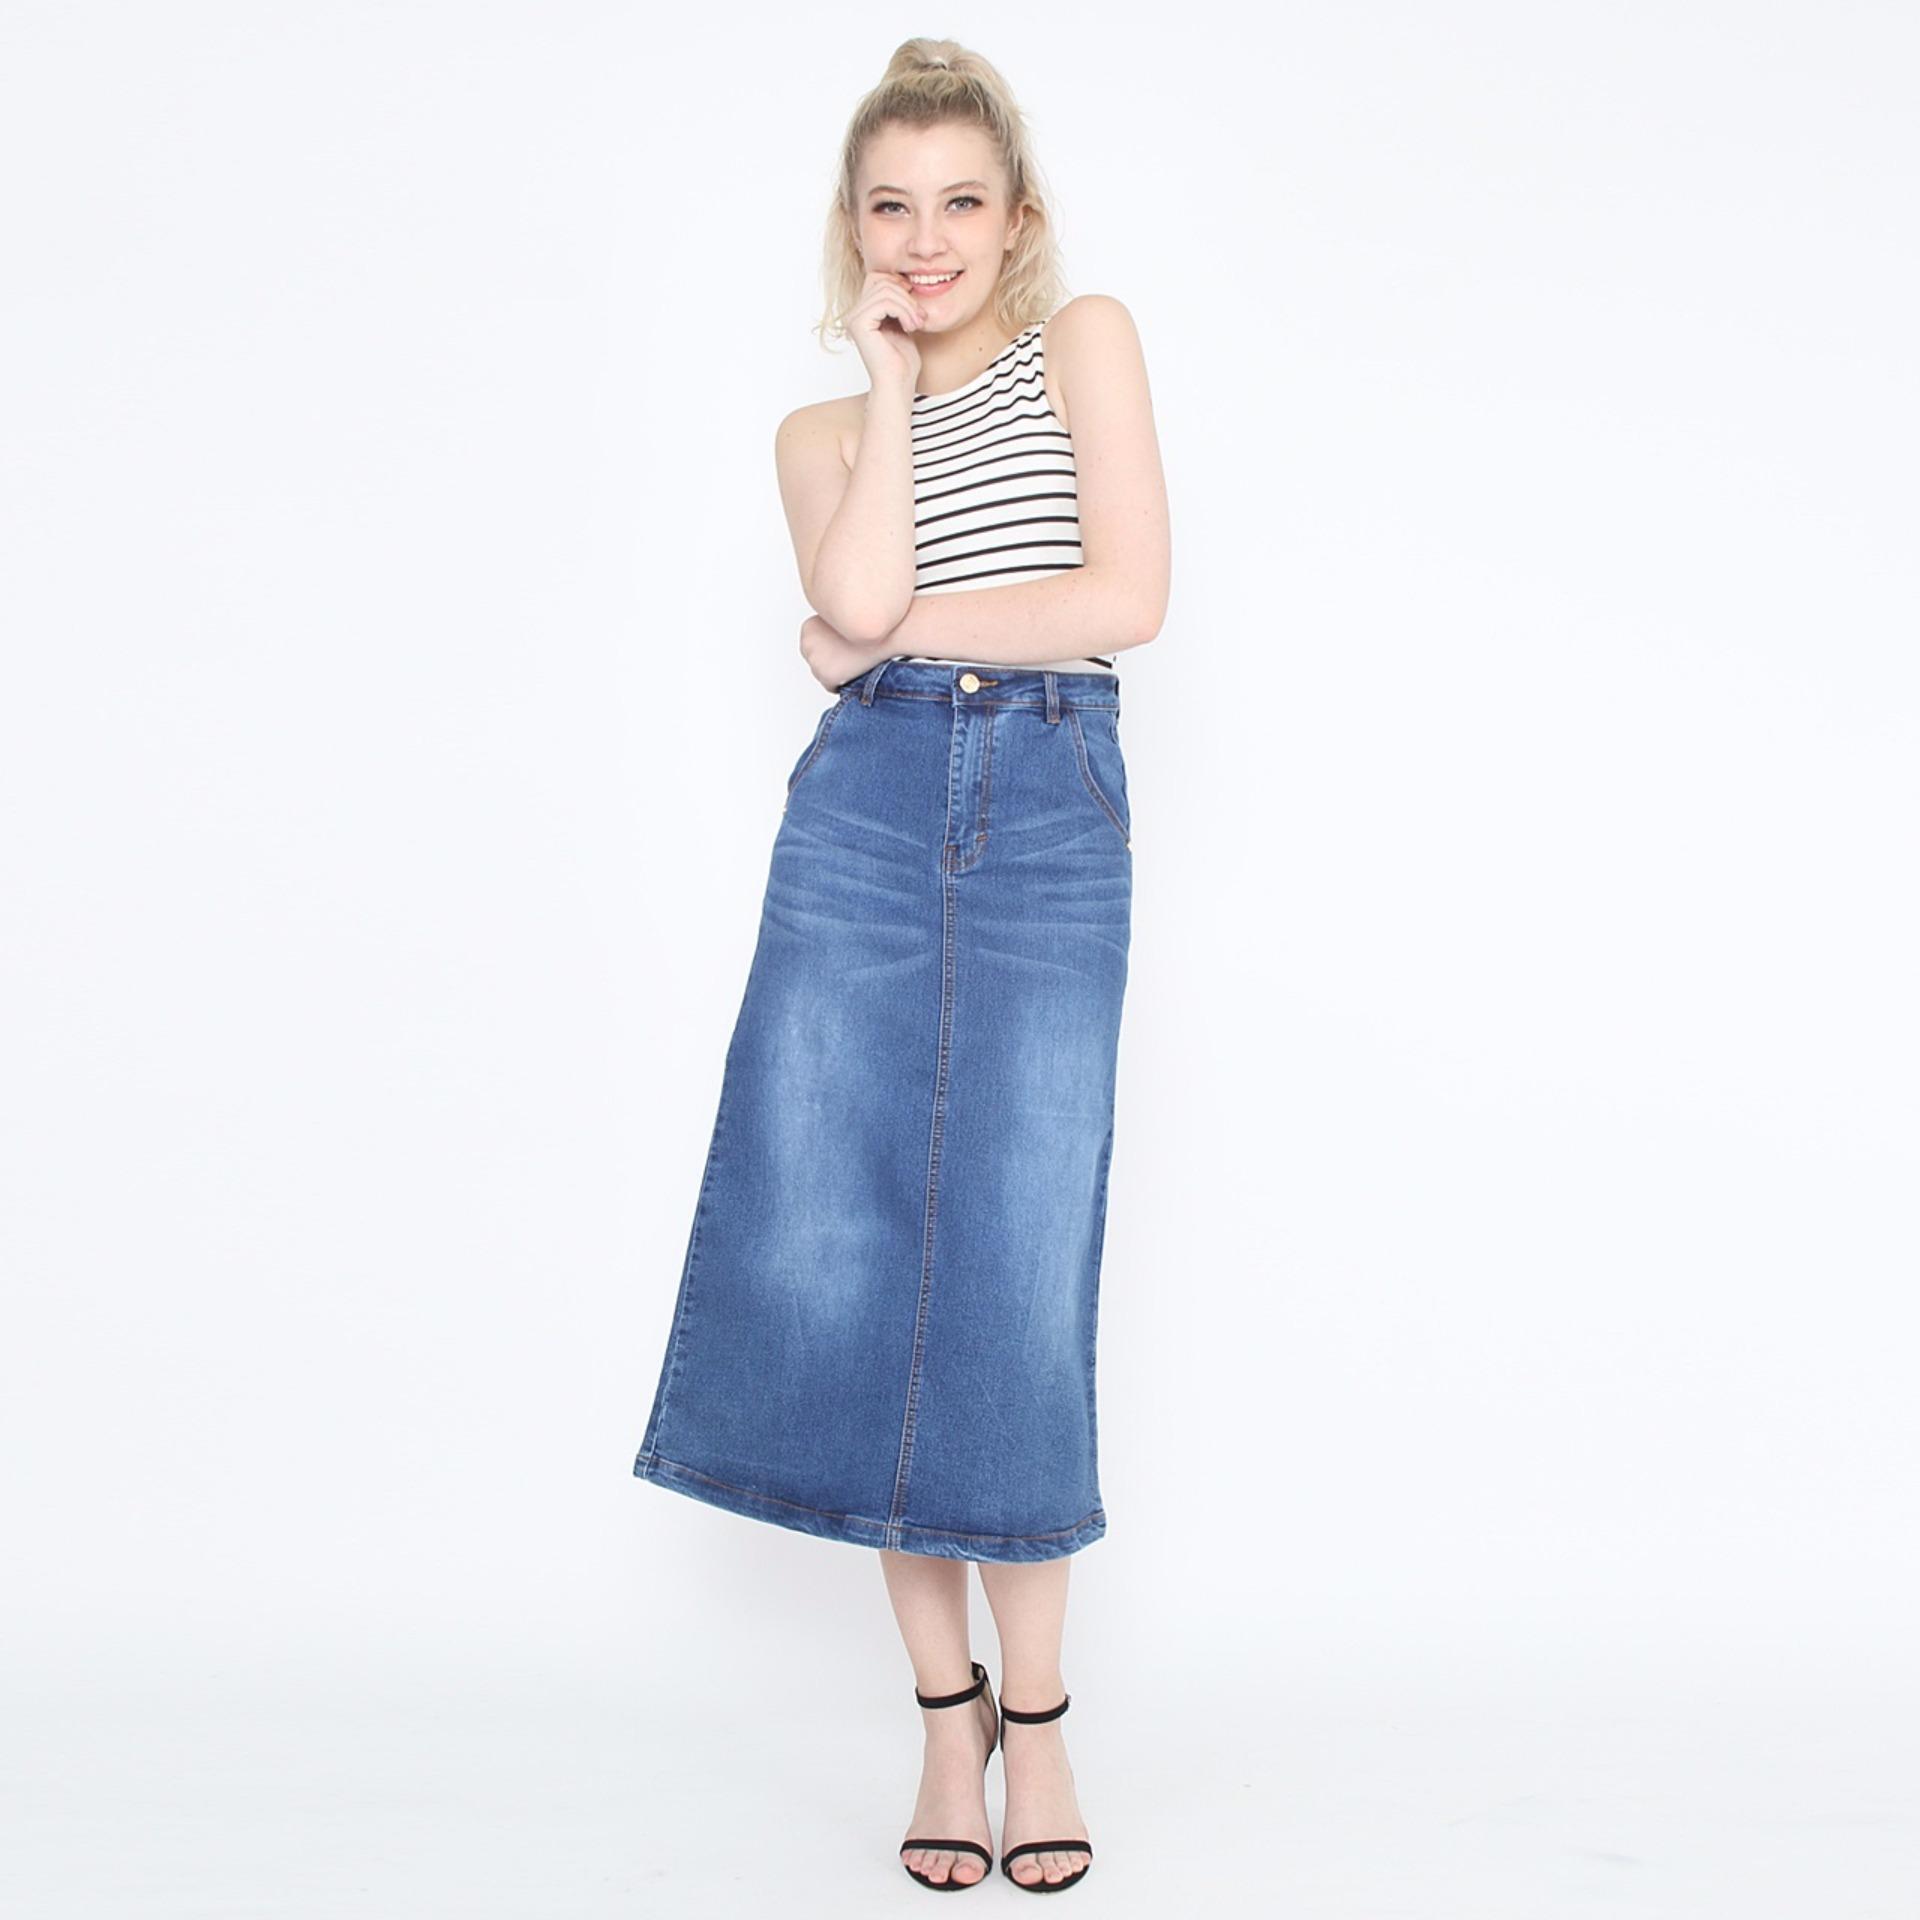 Rok Span Panjang Jeans / Rok Jeans / Rok Span CW 820 RY 101 S